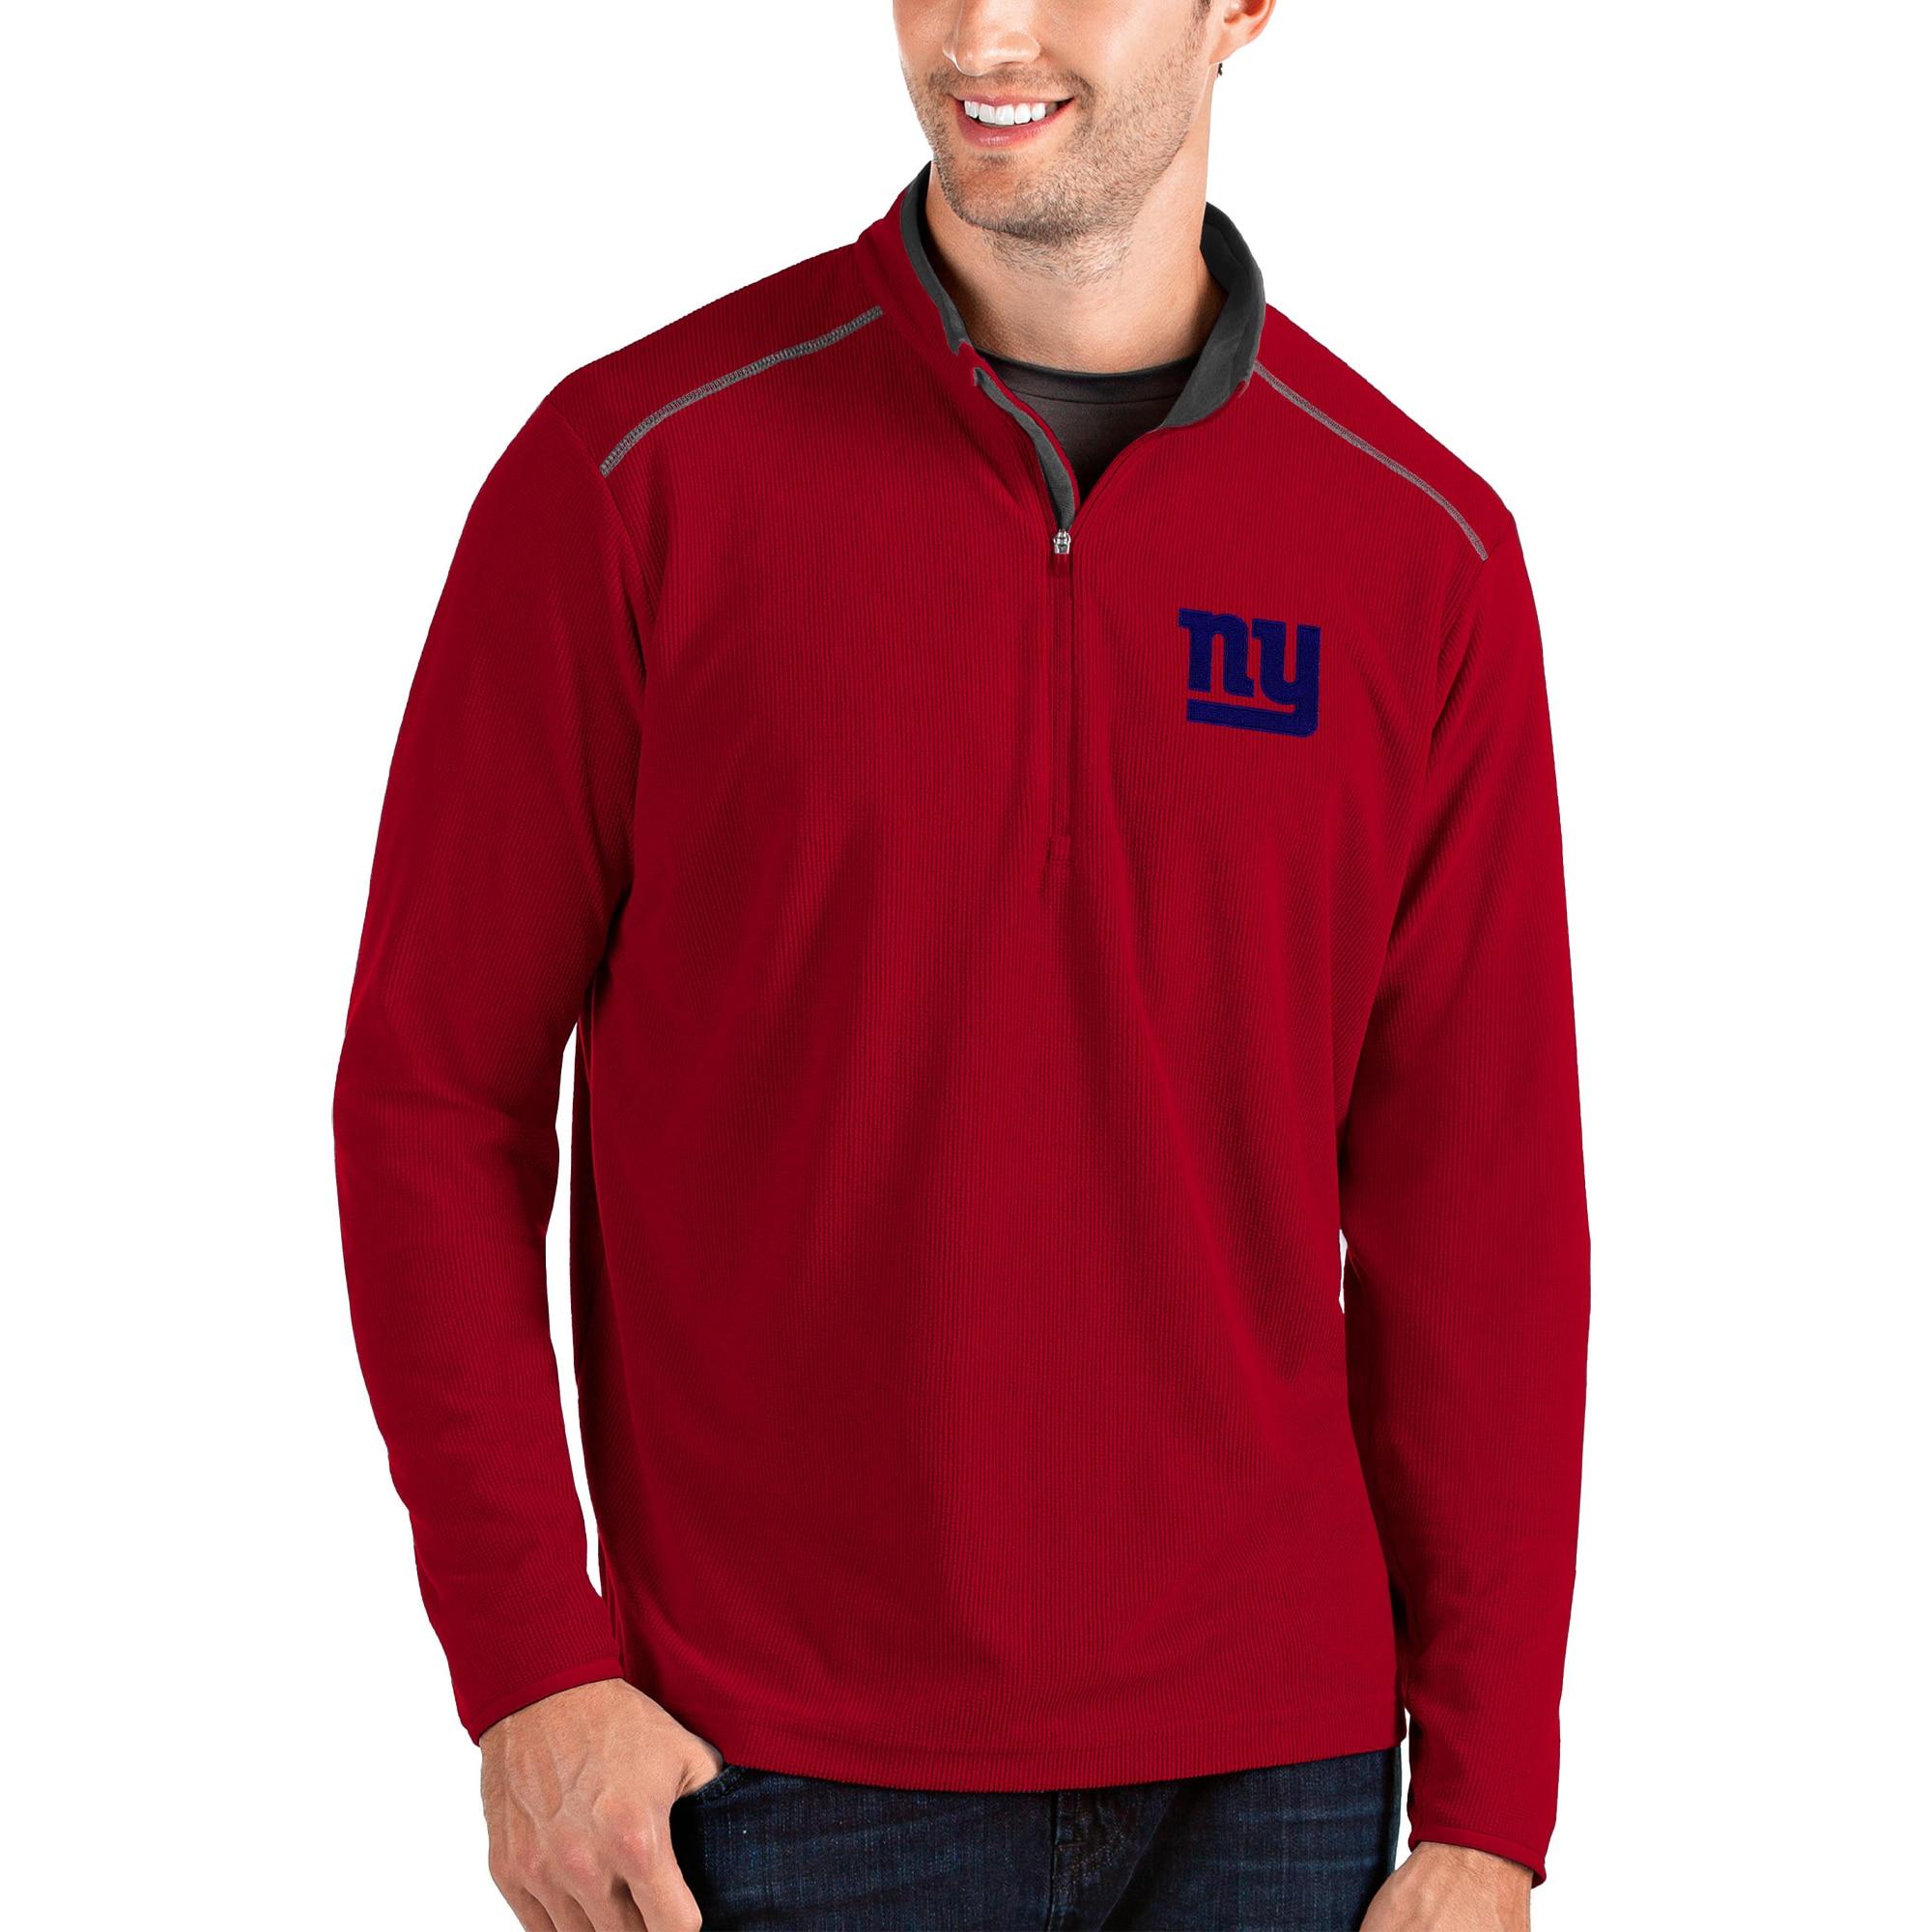 New York Giants Antigua Glacier Quarter-Zip Pullover Jacket - Red/Gray